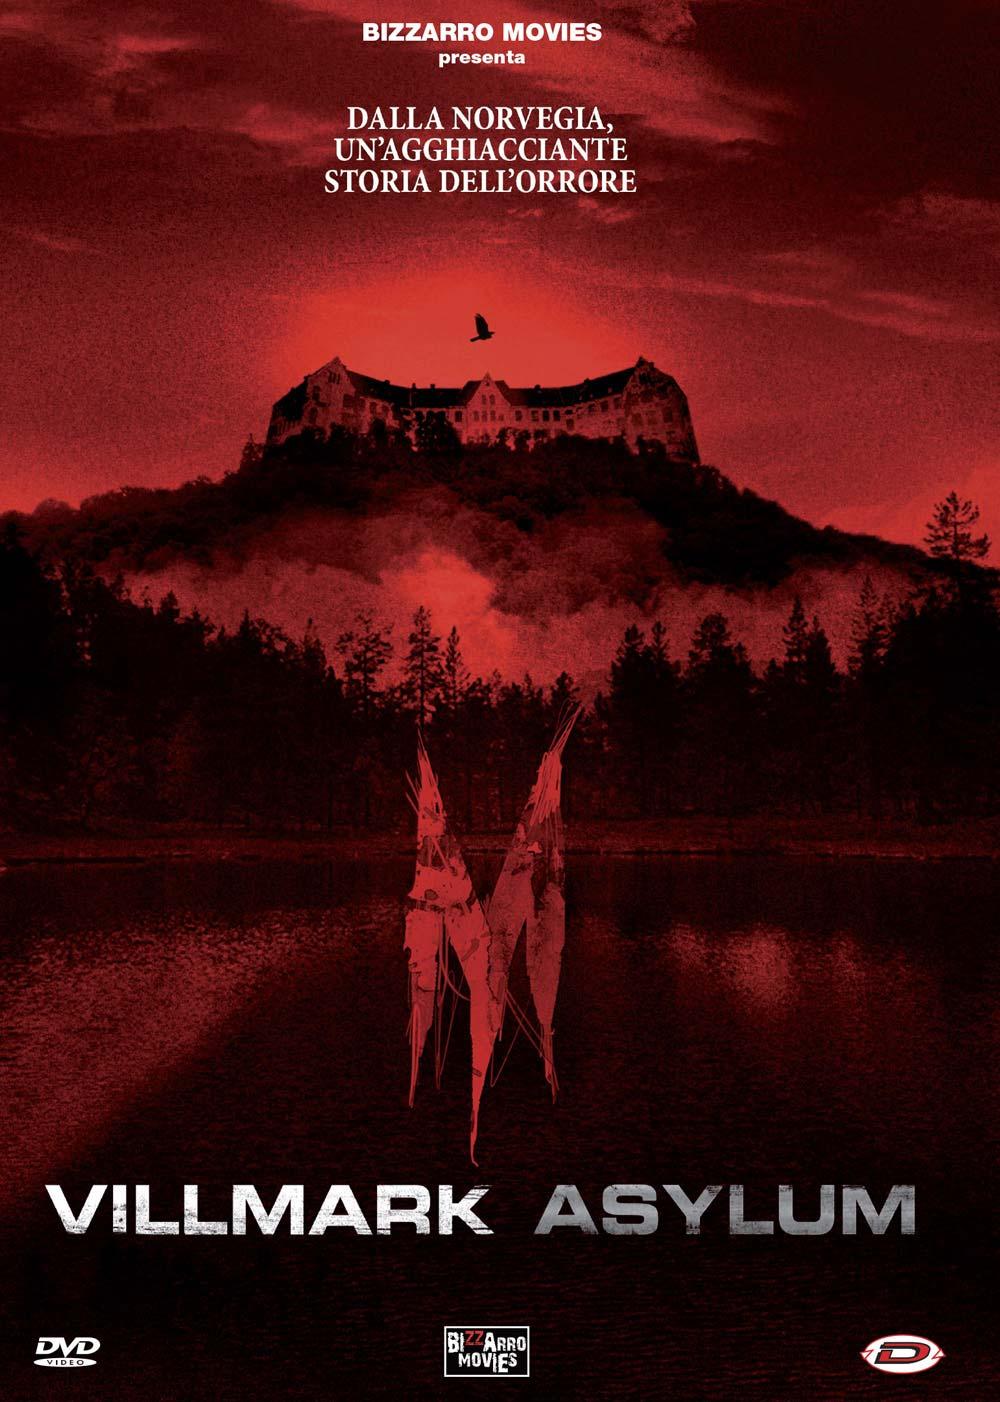 VILLMARK ASYLUM (DVD)